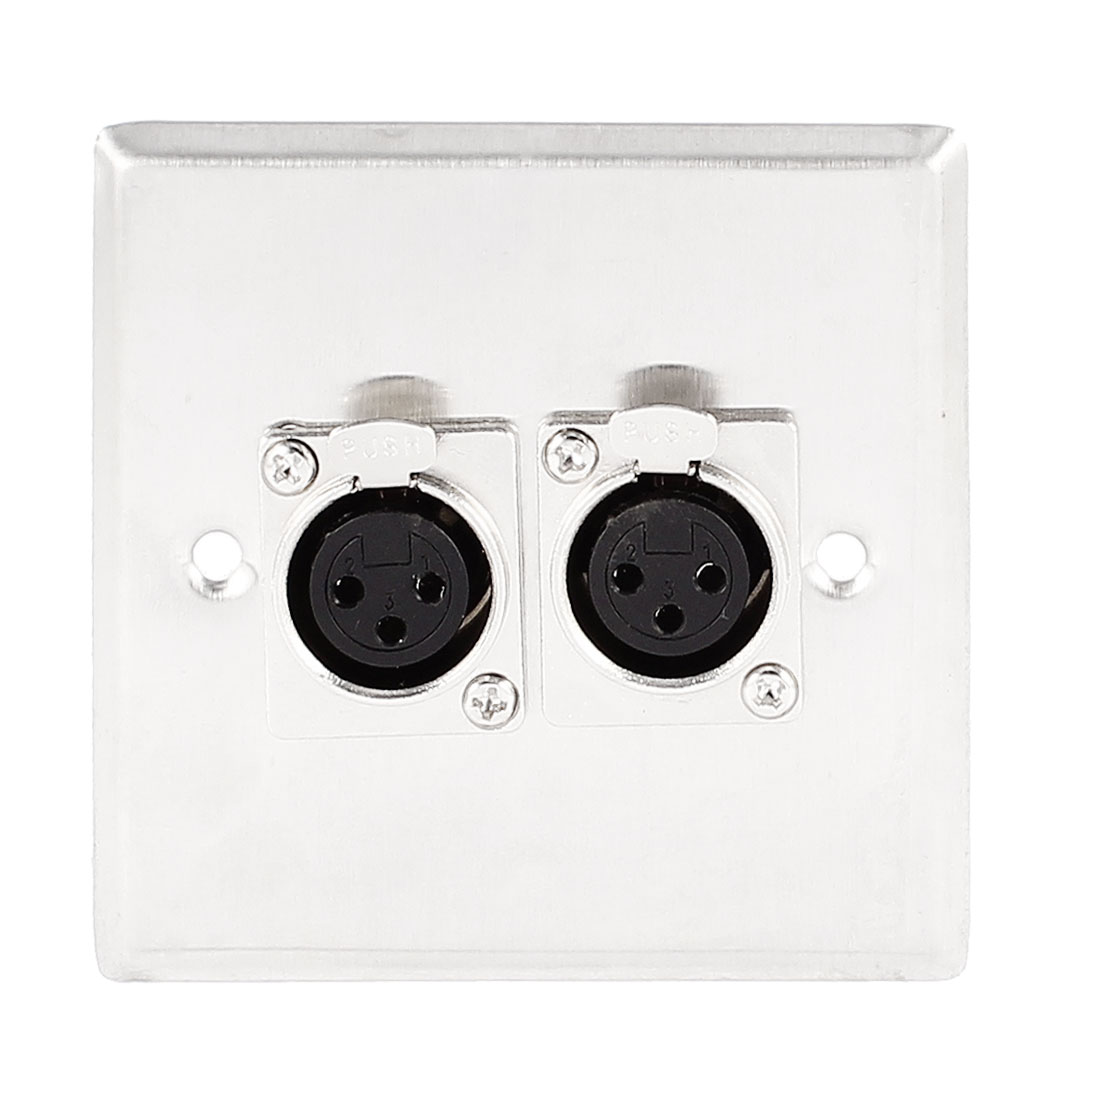 Speaker Metal Dual Female XLR Connector Wall Plate Panel Silver Tone 85mm x 85mm